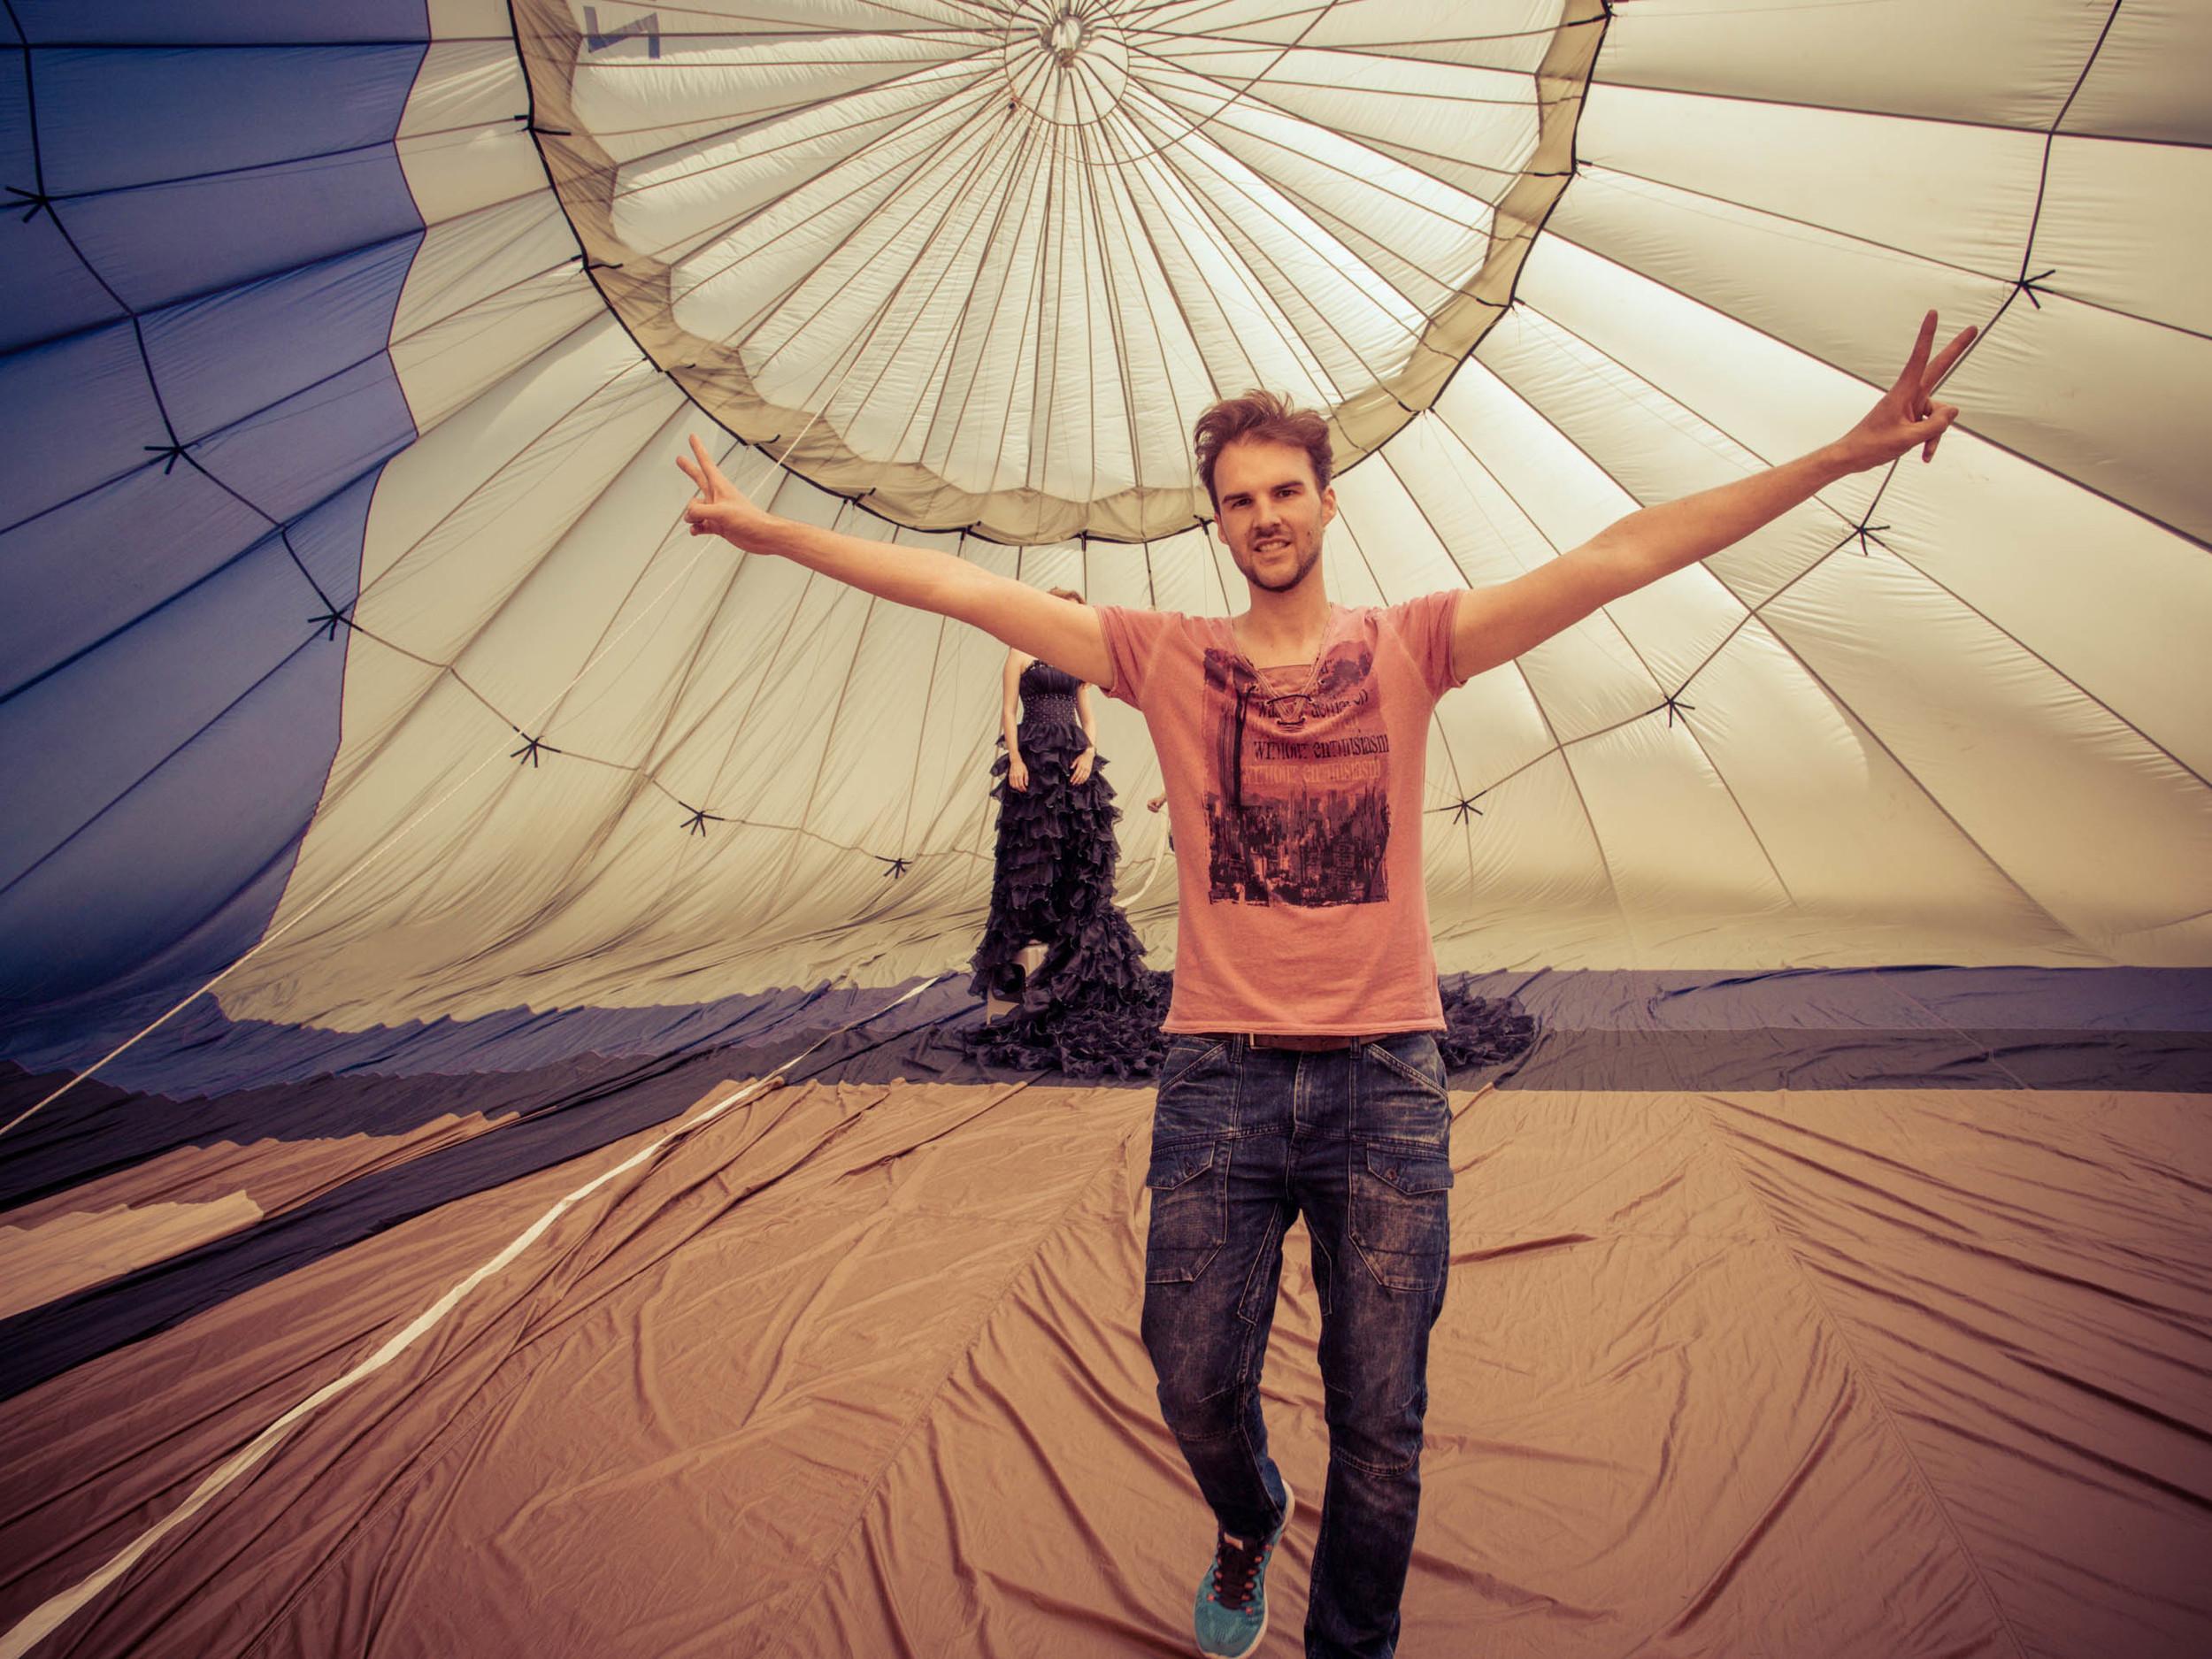 Heisslufballon_OMD-145.jpg